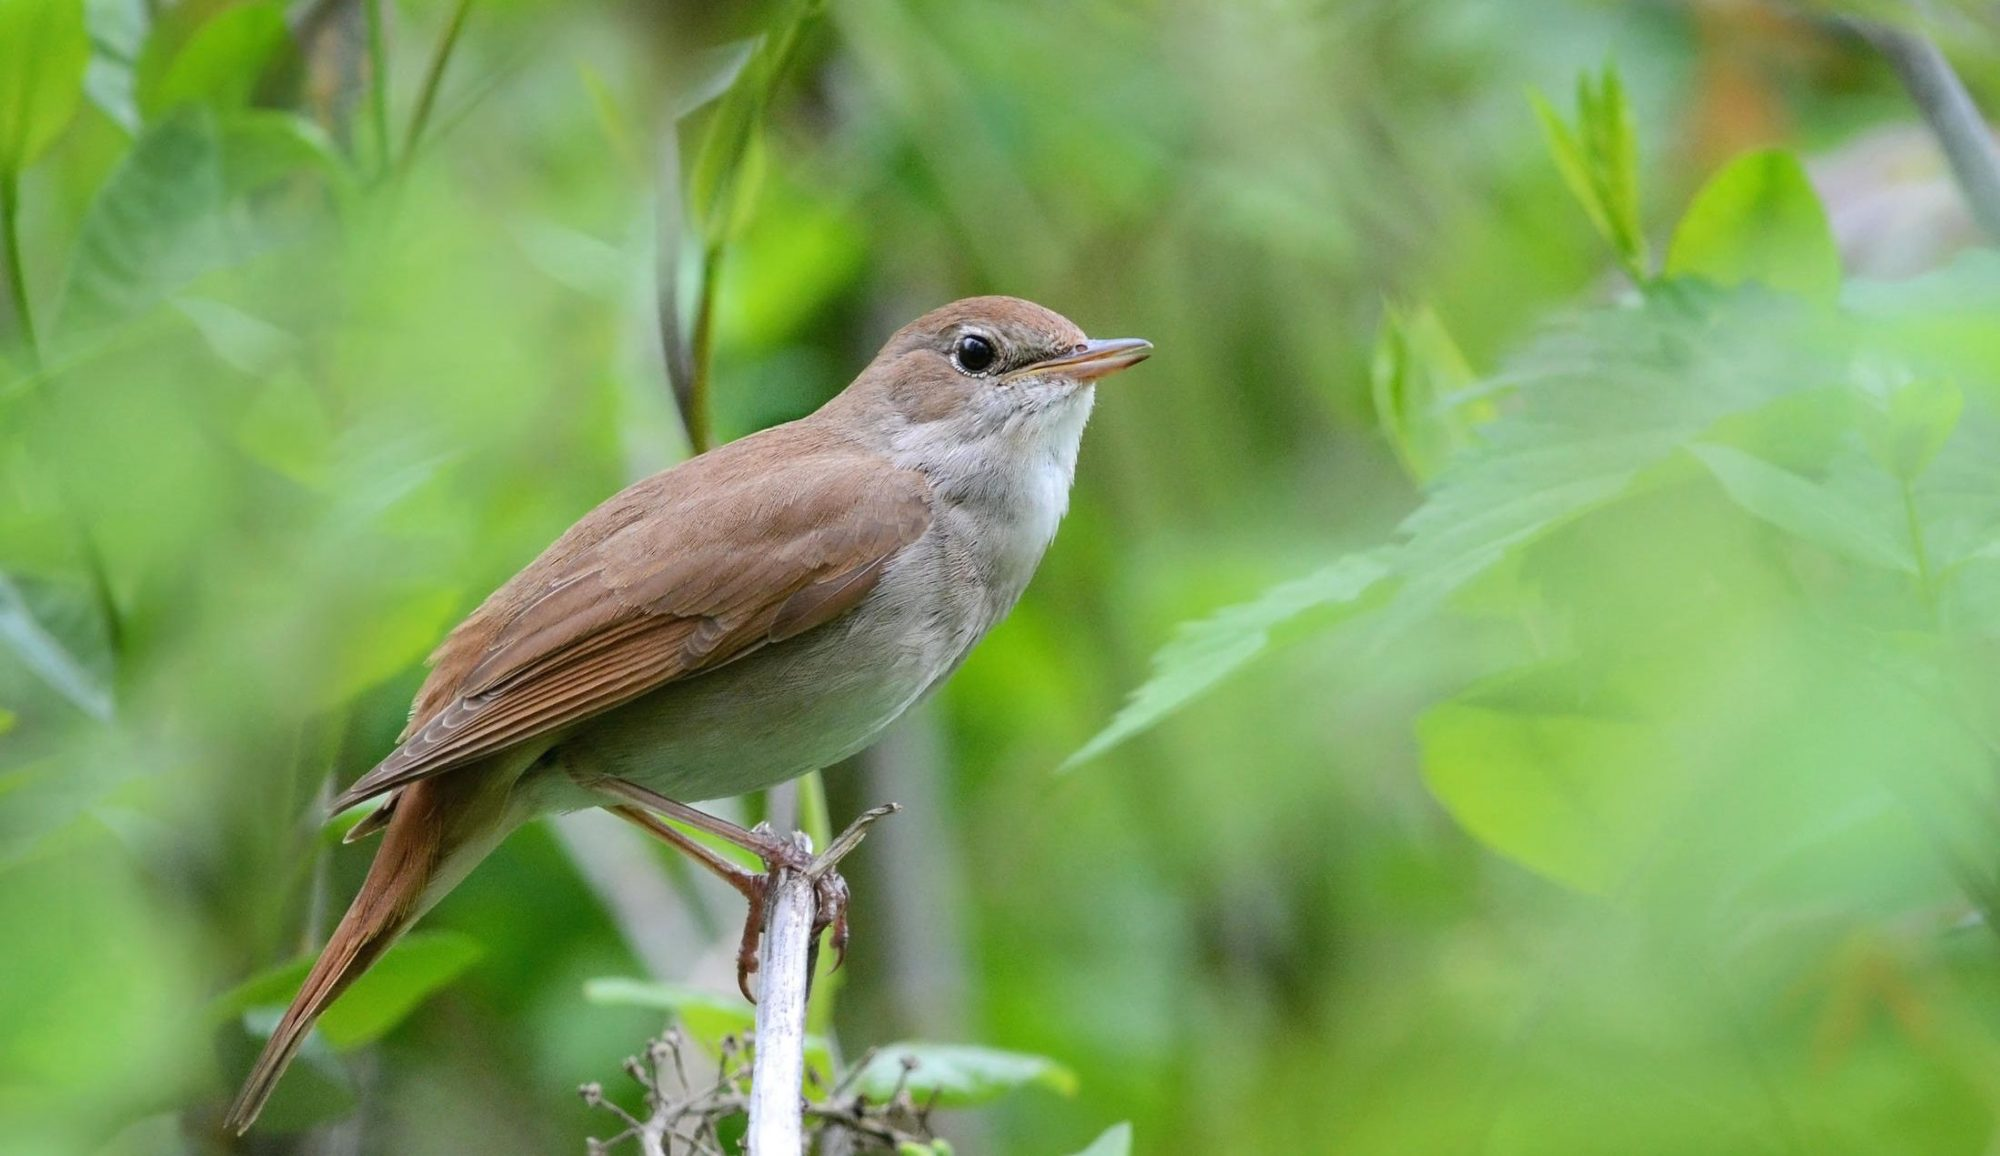 Common nightingale singing tour